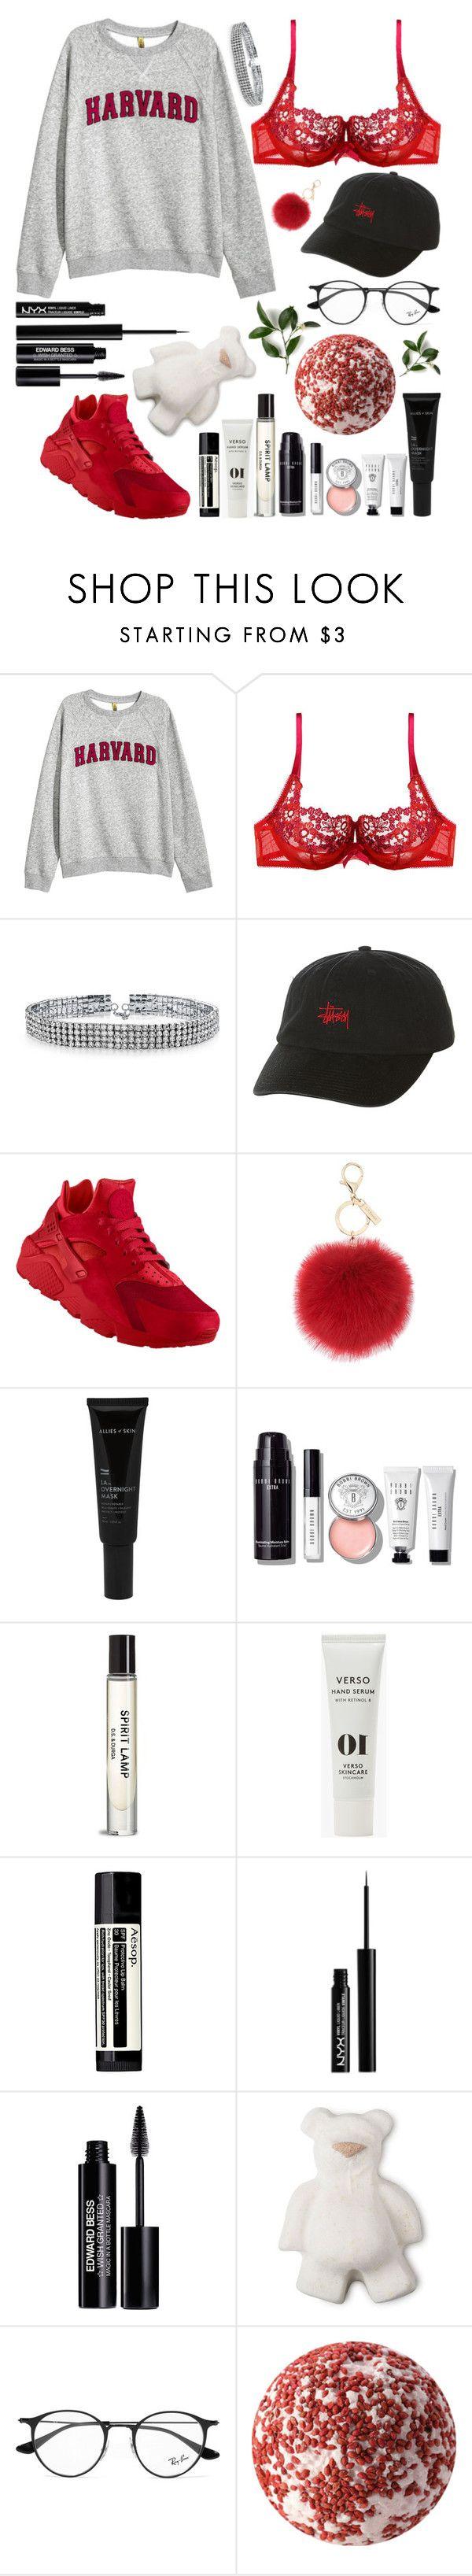 """●v o r f r e u d e◎"" by lilsavageboo ❤ liked on Polyvore featuring H&M, Gossard, Bling Jewelry, Stussy, NIKE, L.K.Bennett, Allies of Skin, Bobbi Brown Cosmetics, Verso and Aesop"